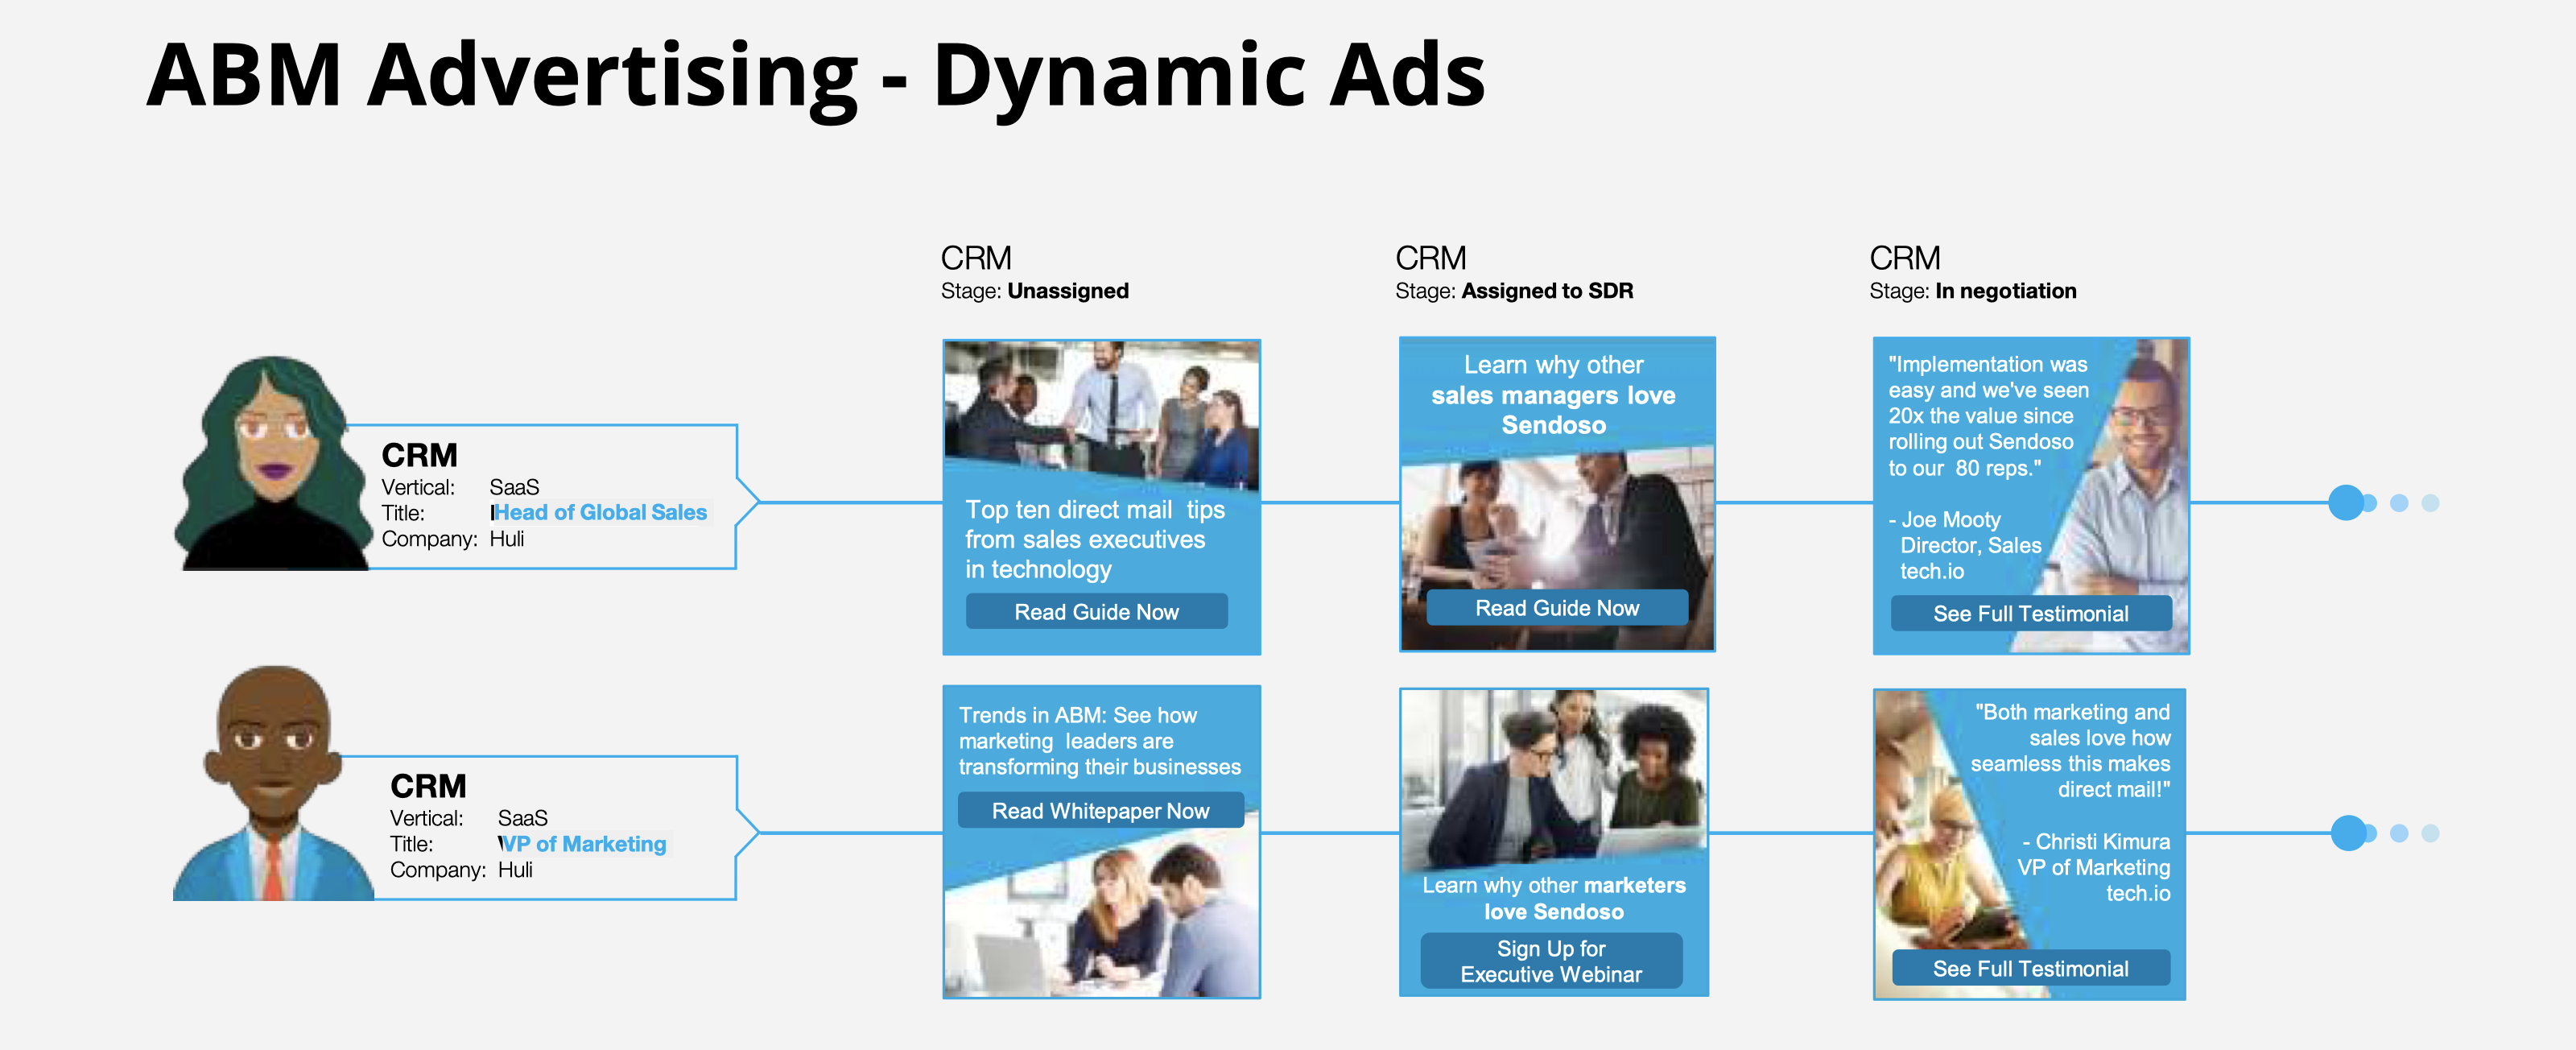 abm advertising dynamic ads